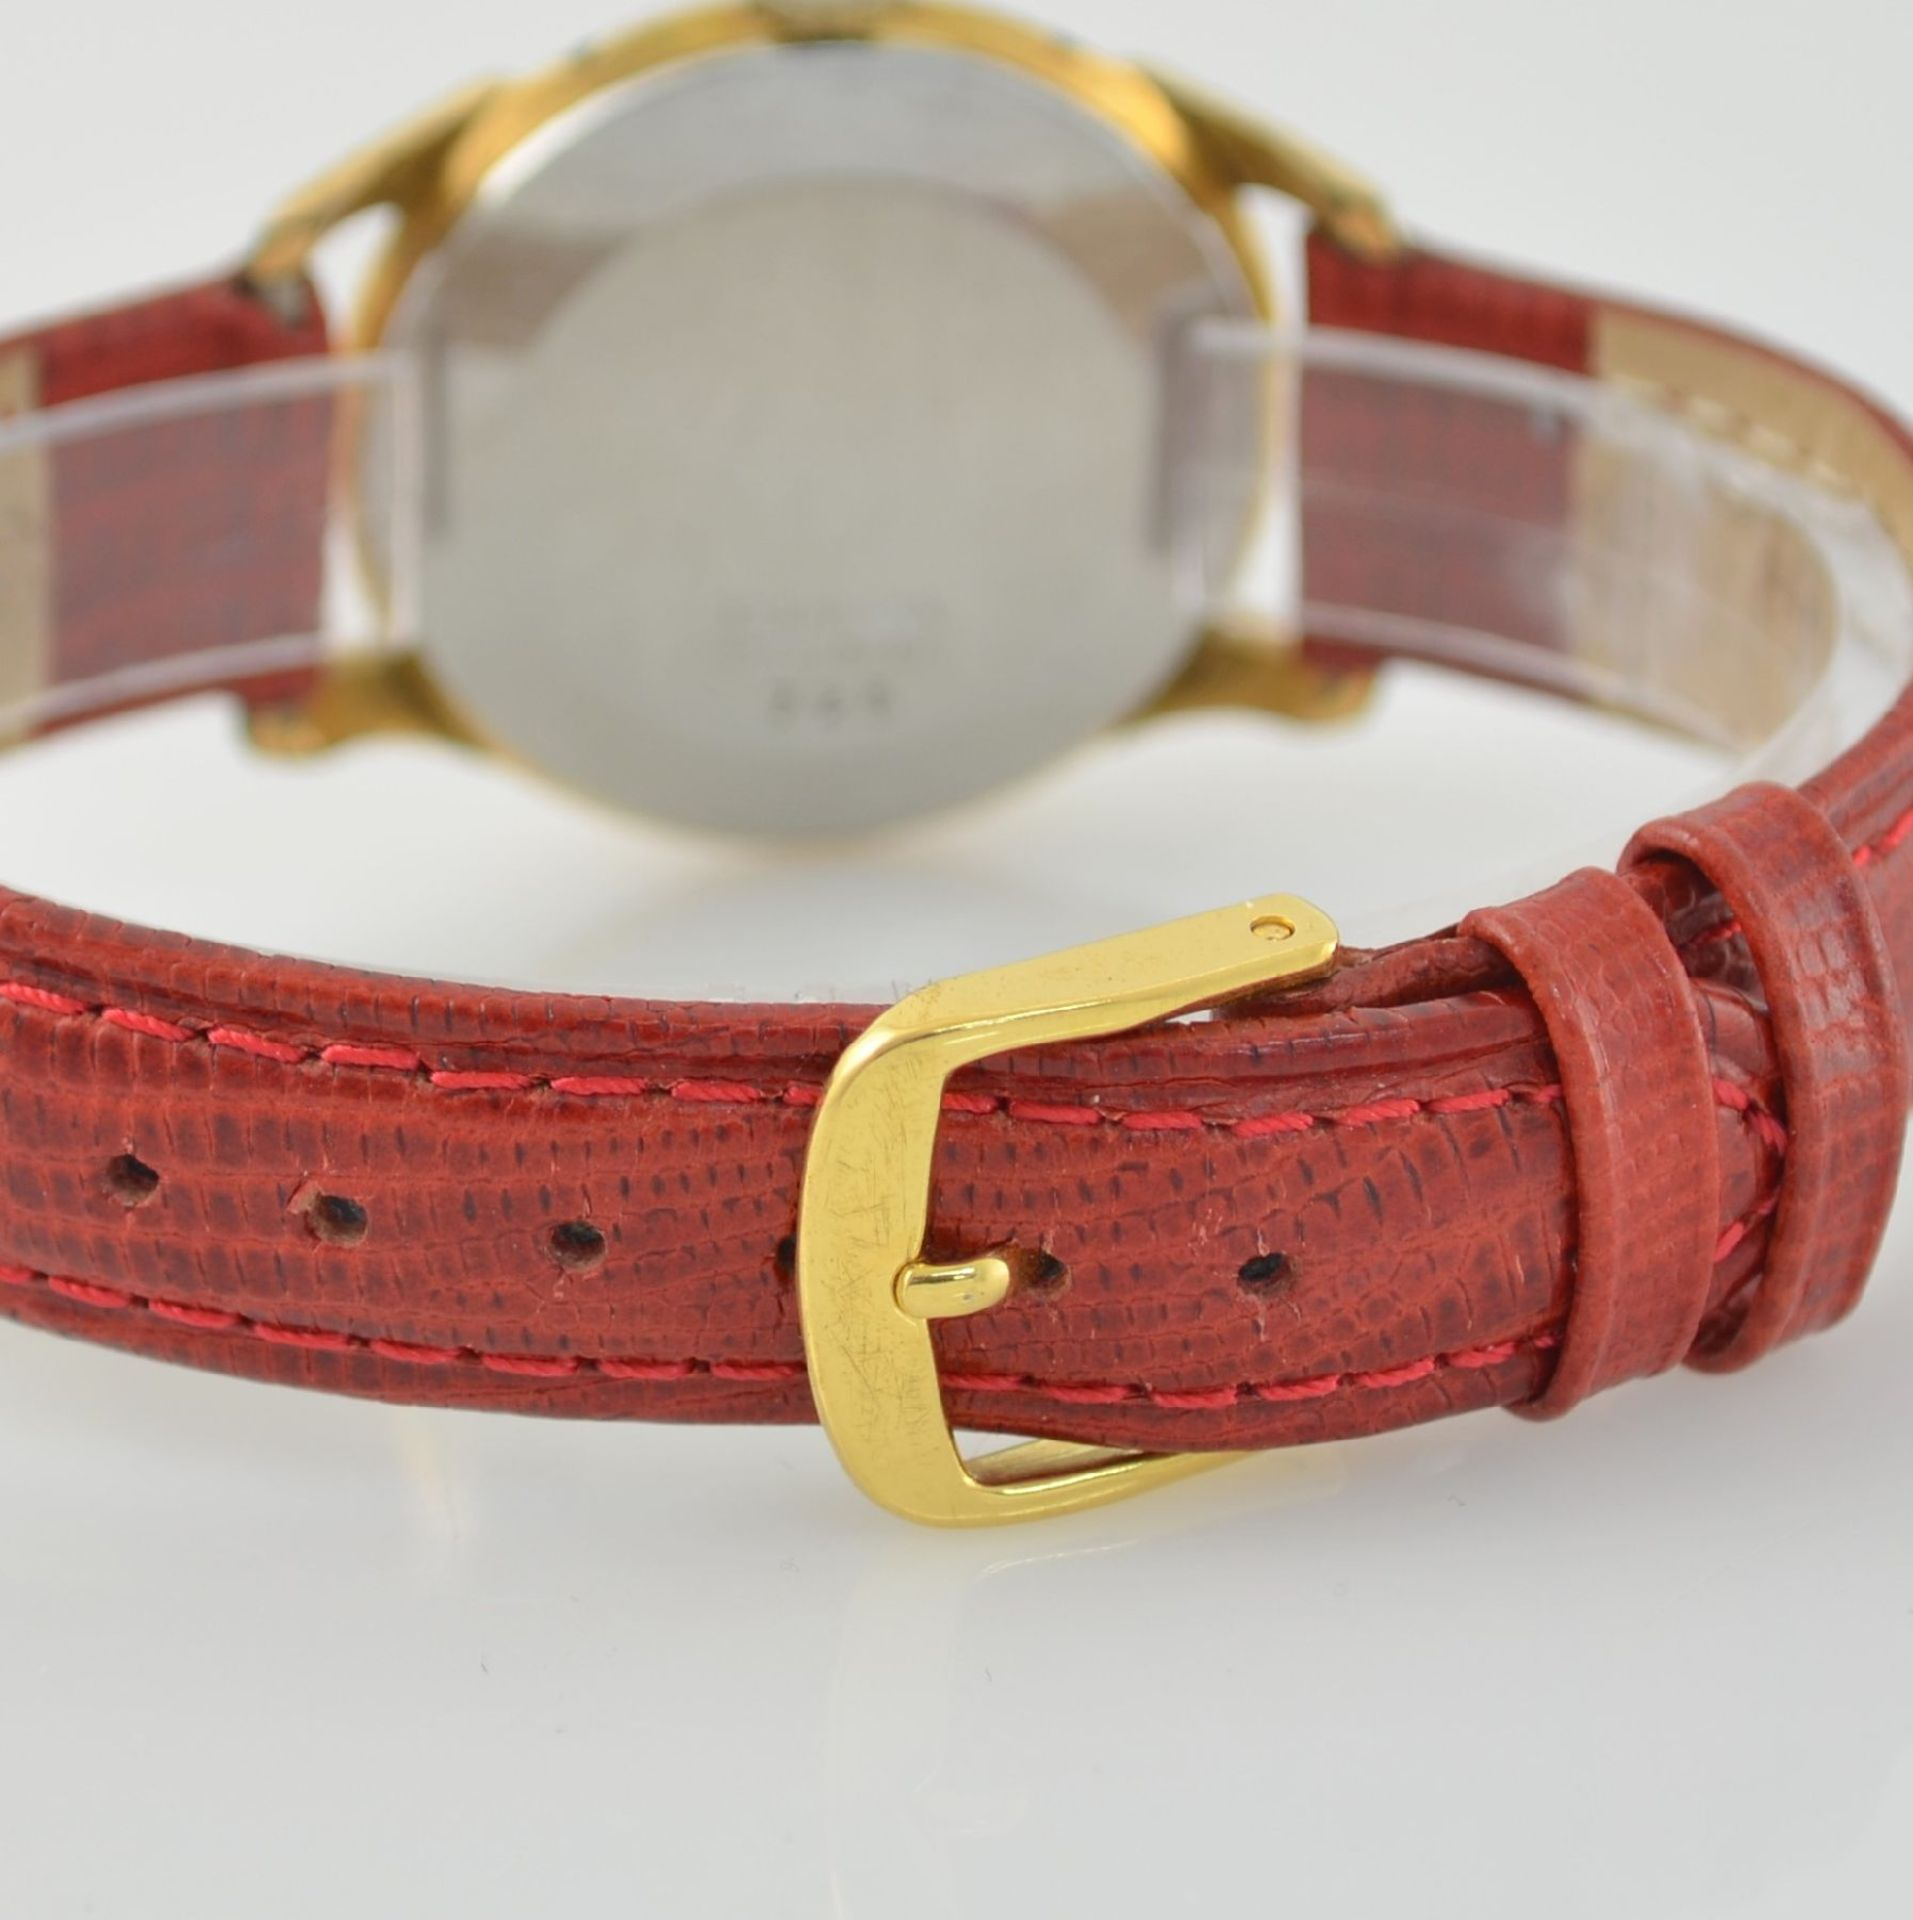 Konvolut: 2 Armbanduhren mit Kalender bzw. Datum, Schweiz um 1950-1960, Handaufzug, 1) NACAR m. - Bild 5 aus 12